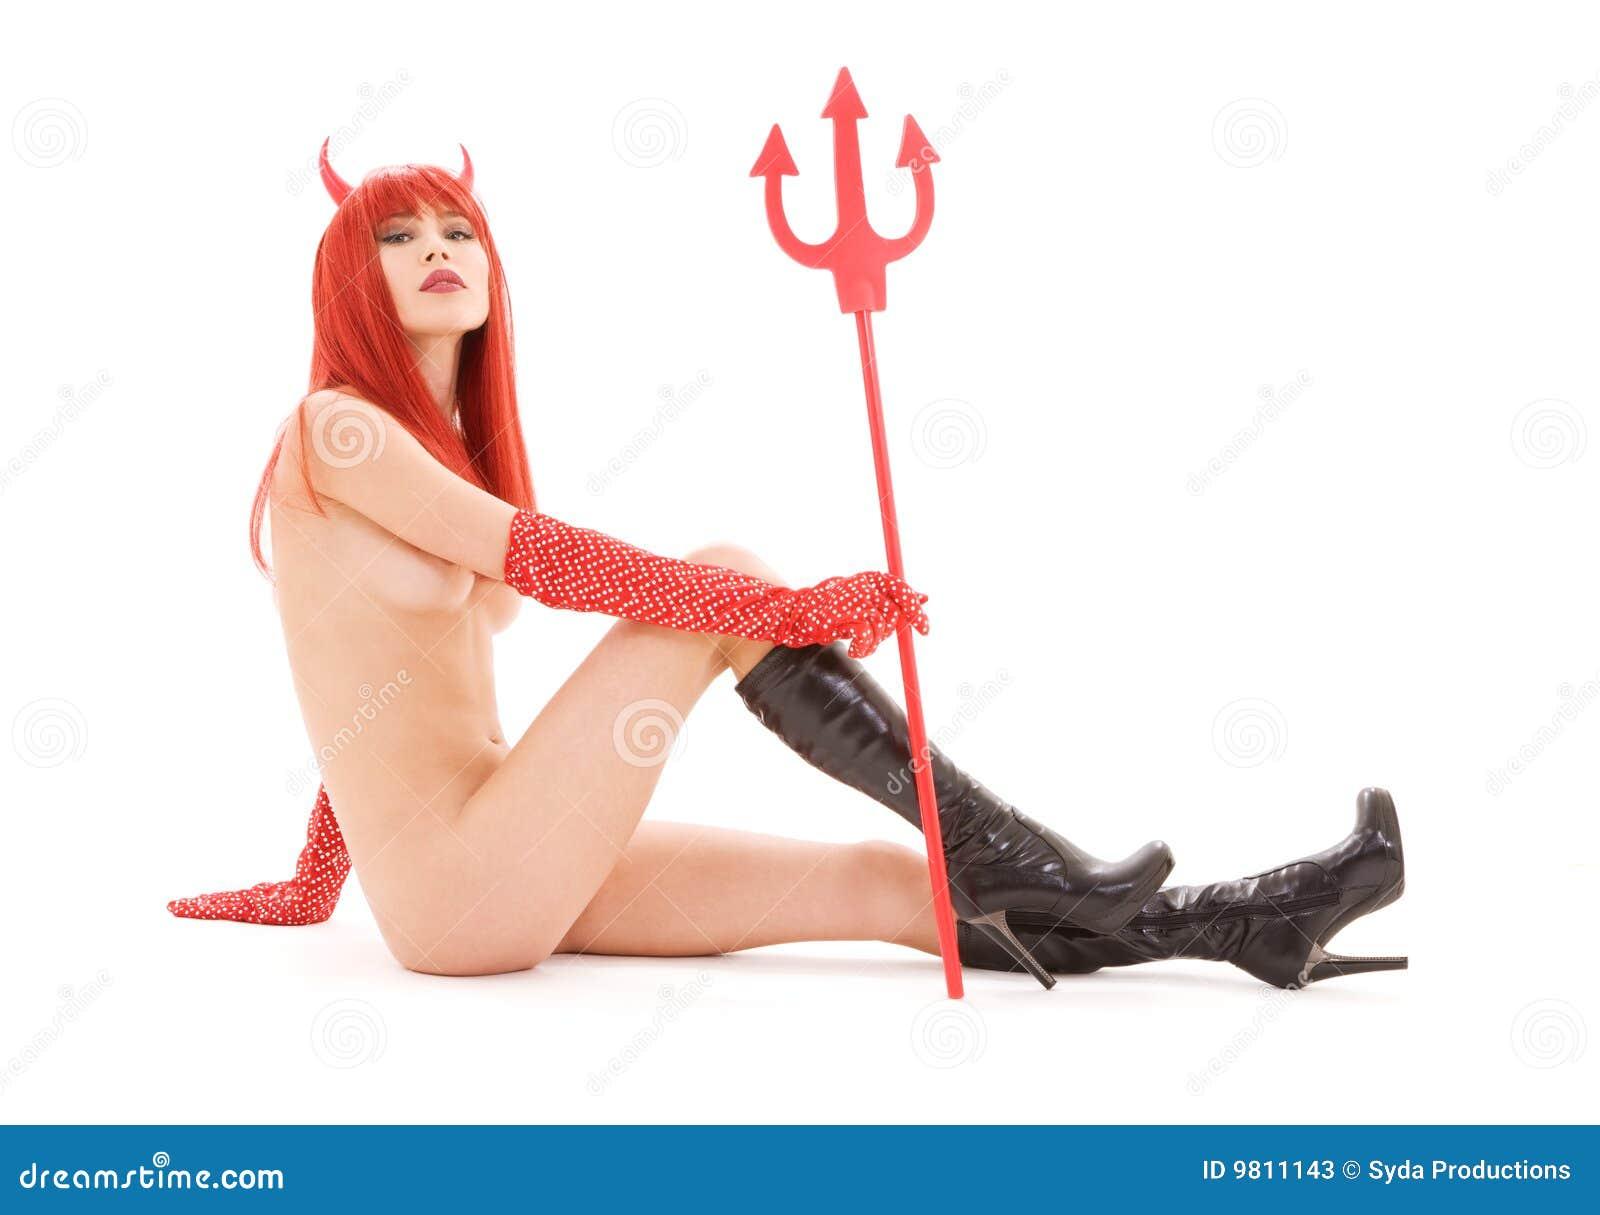 Devil girl sex nude sex photo